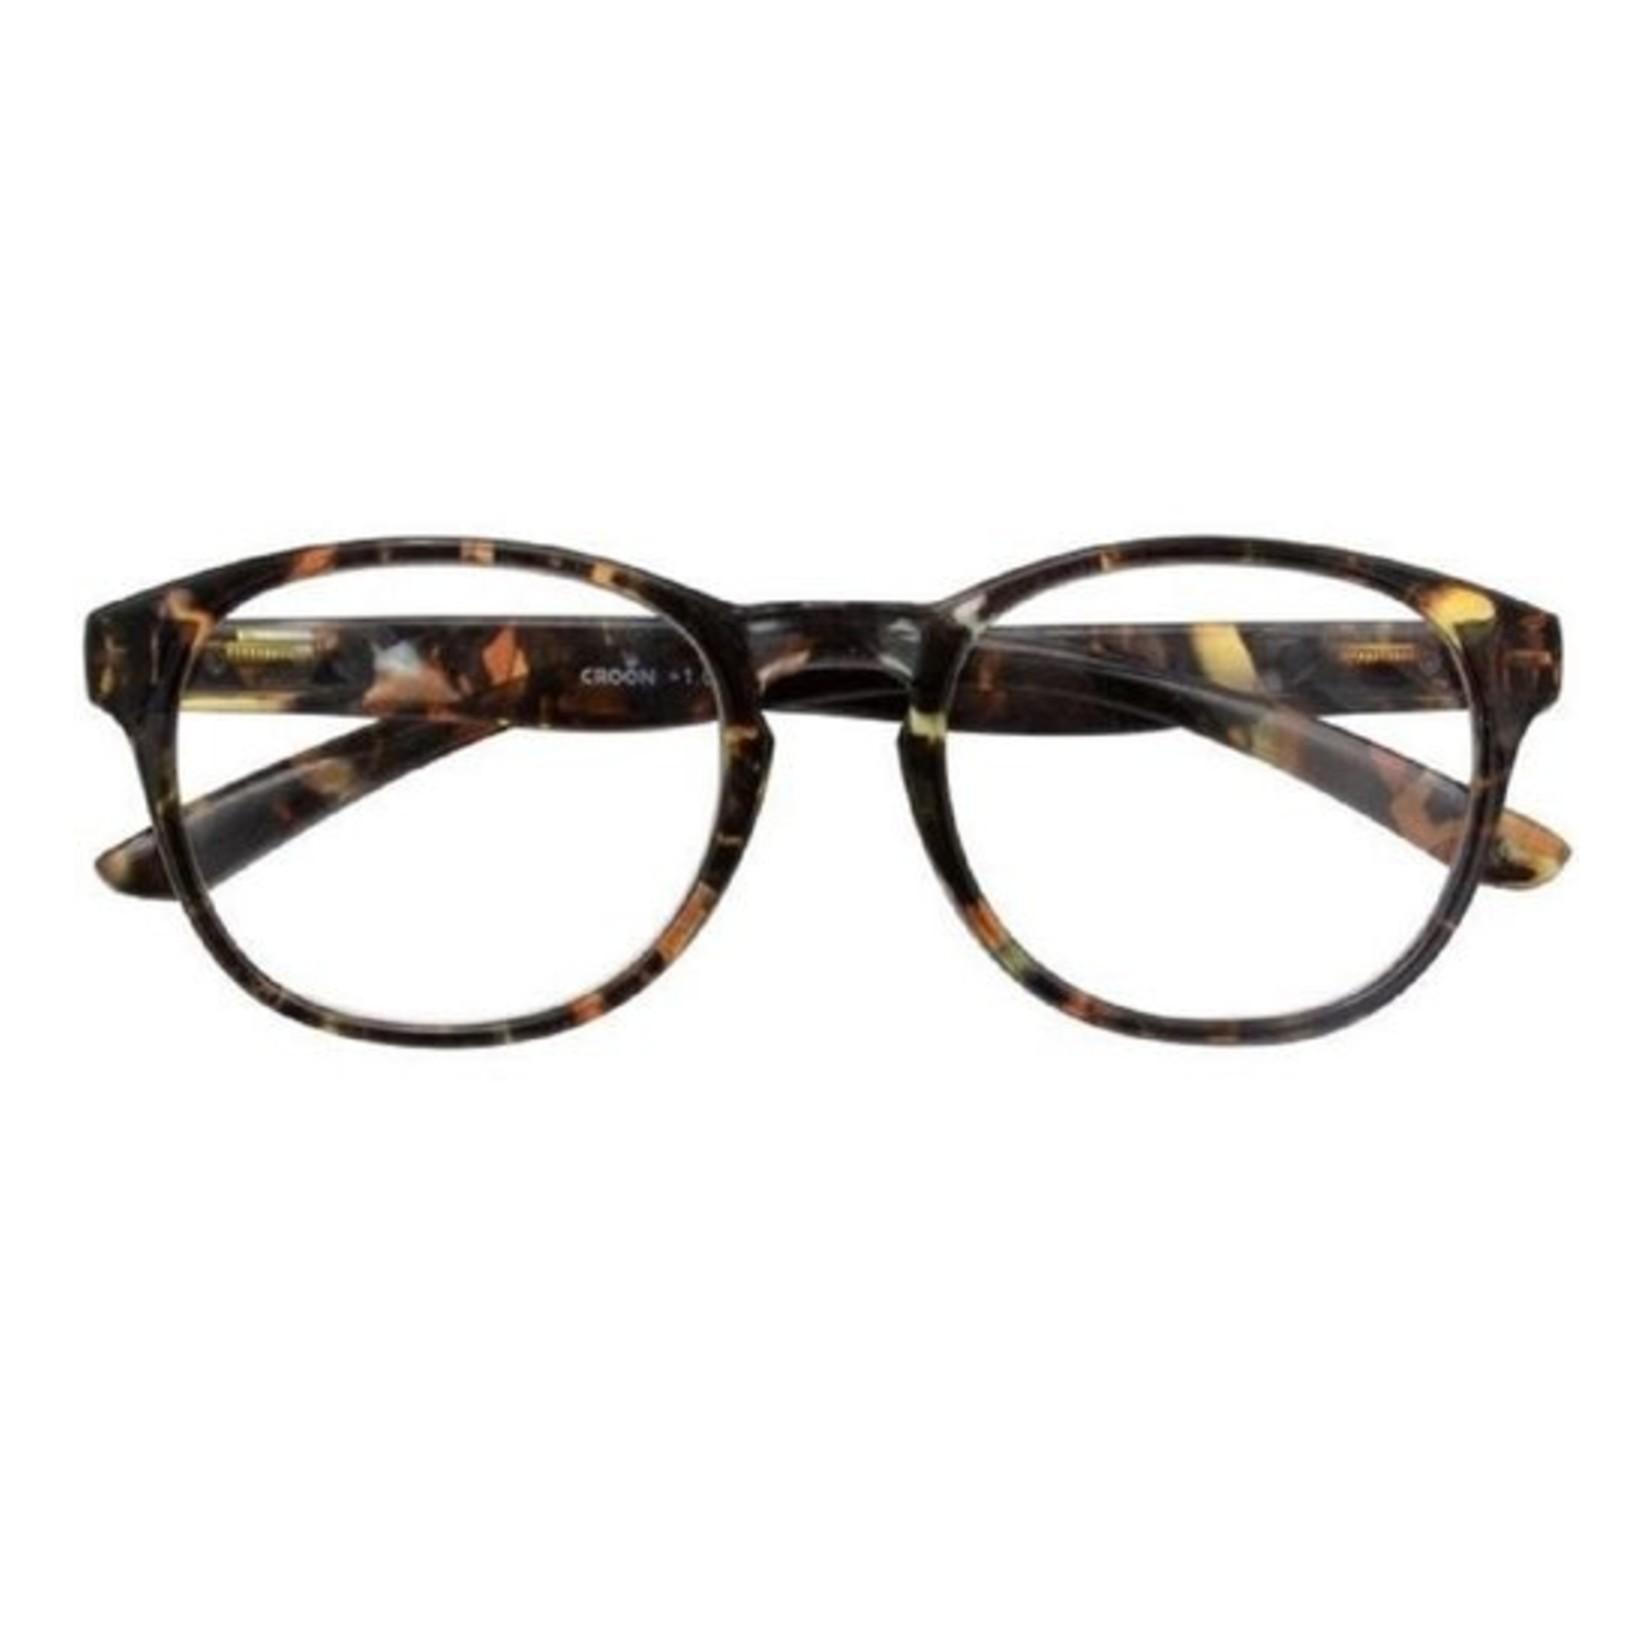 Croon Neville Havanna Brown leesbril